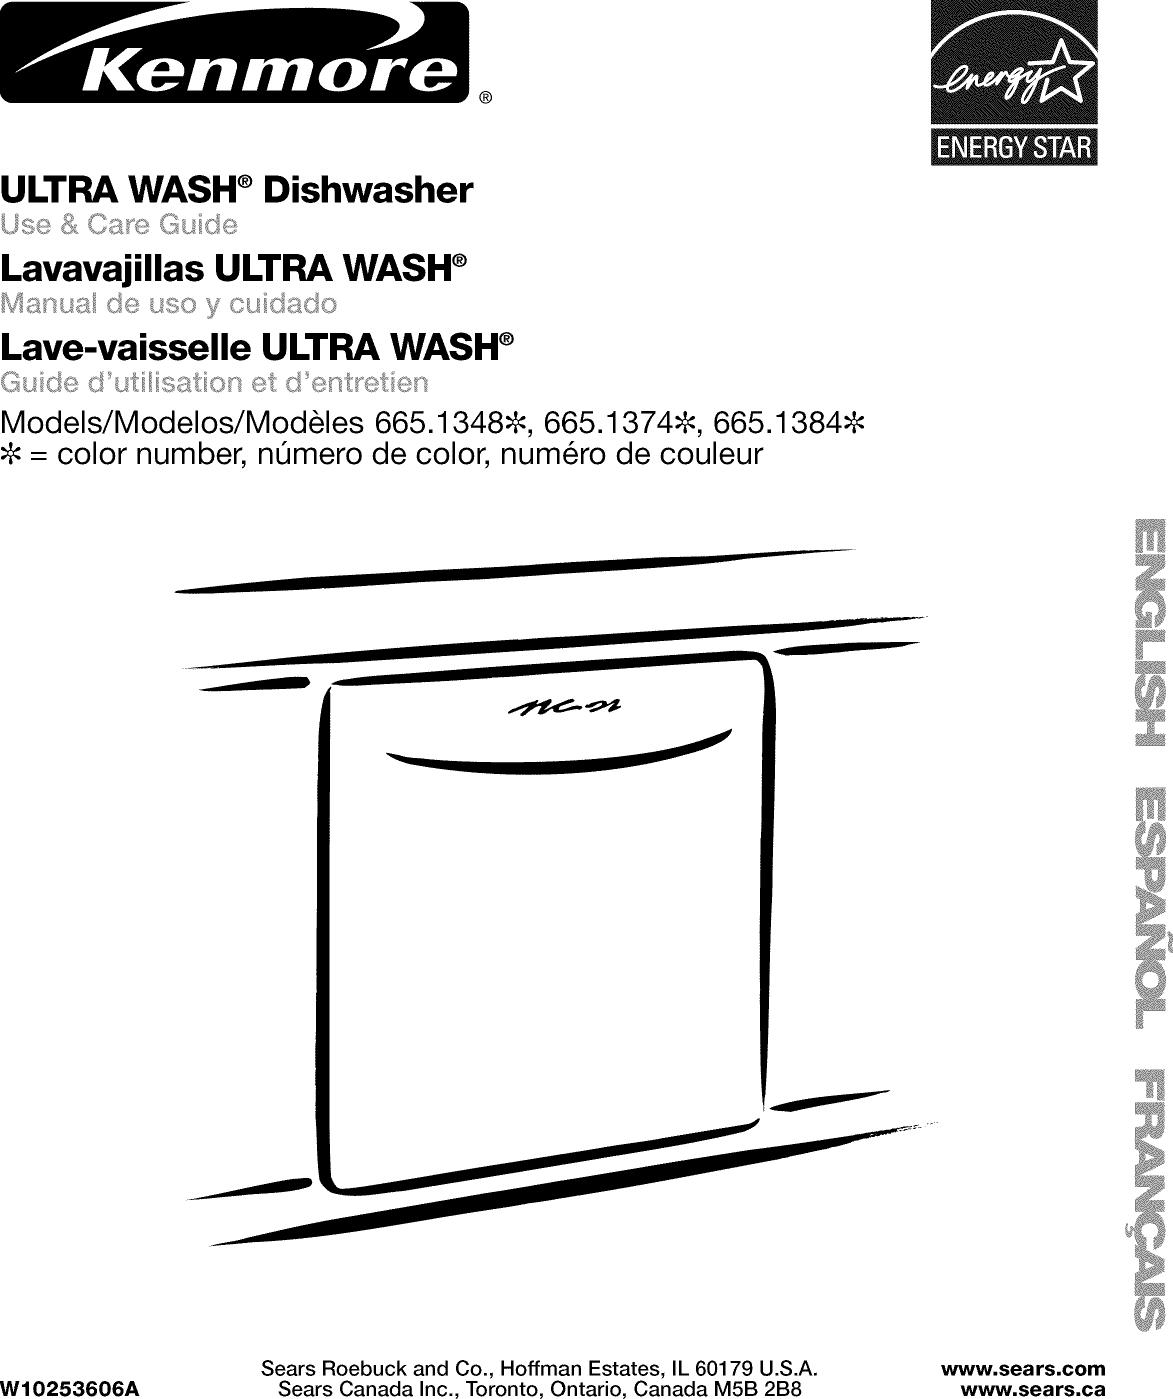 ®ULTRA WASH ®DishwasherLavavajillas ULTRA WASH ®Manua (Se uso y cu c£